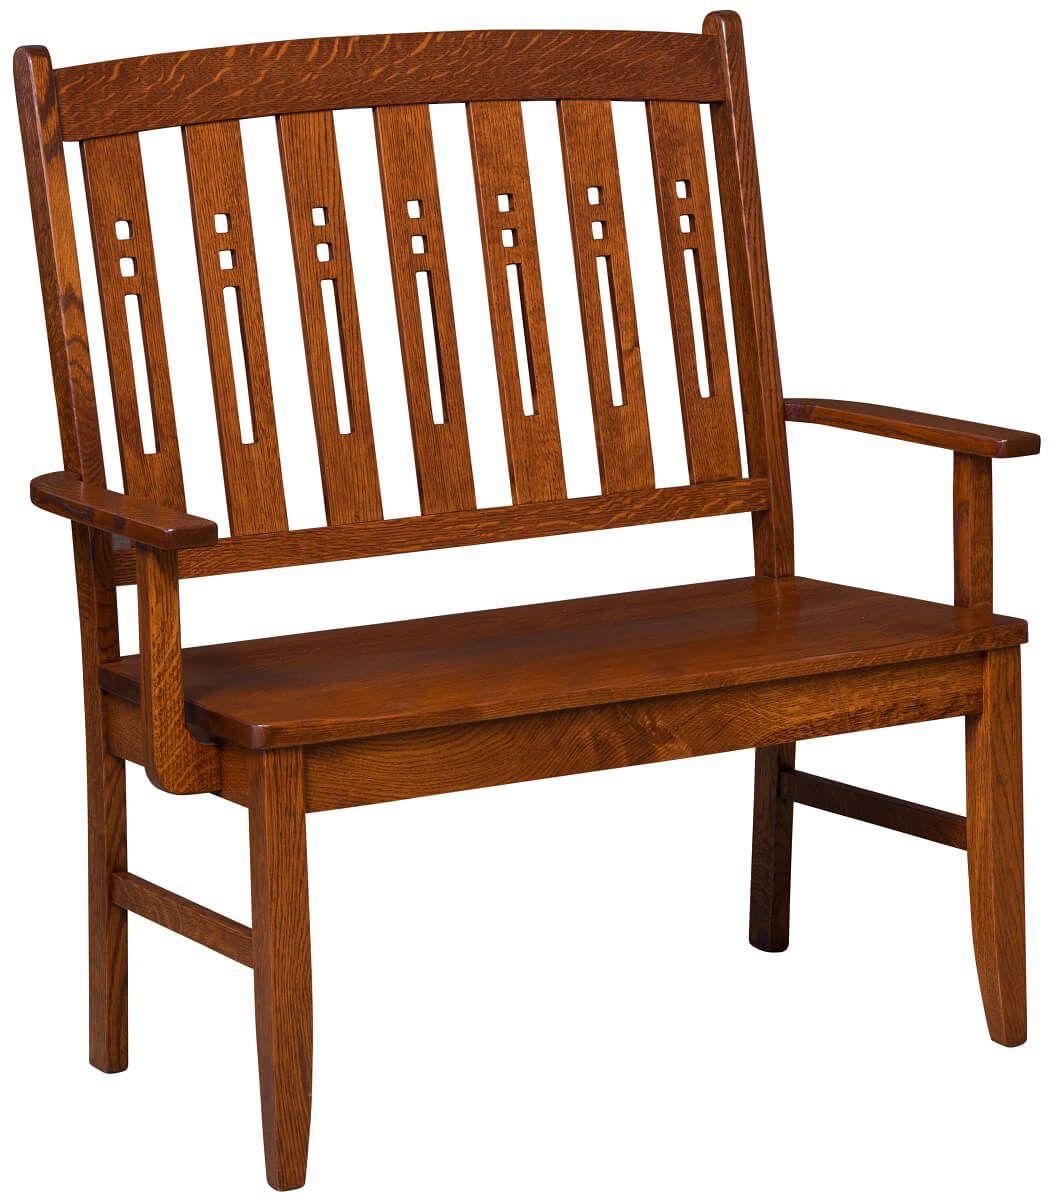 Elbridge Arts and Crafts Bench